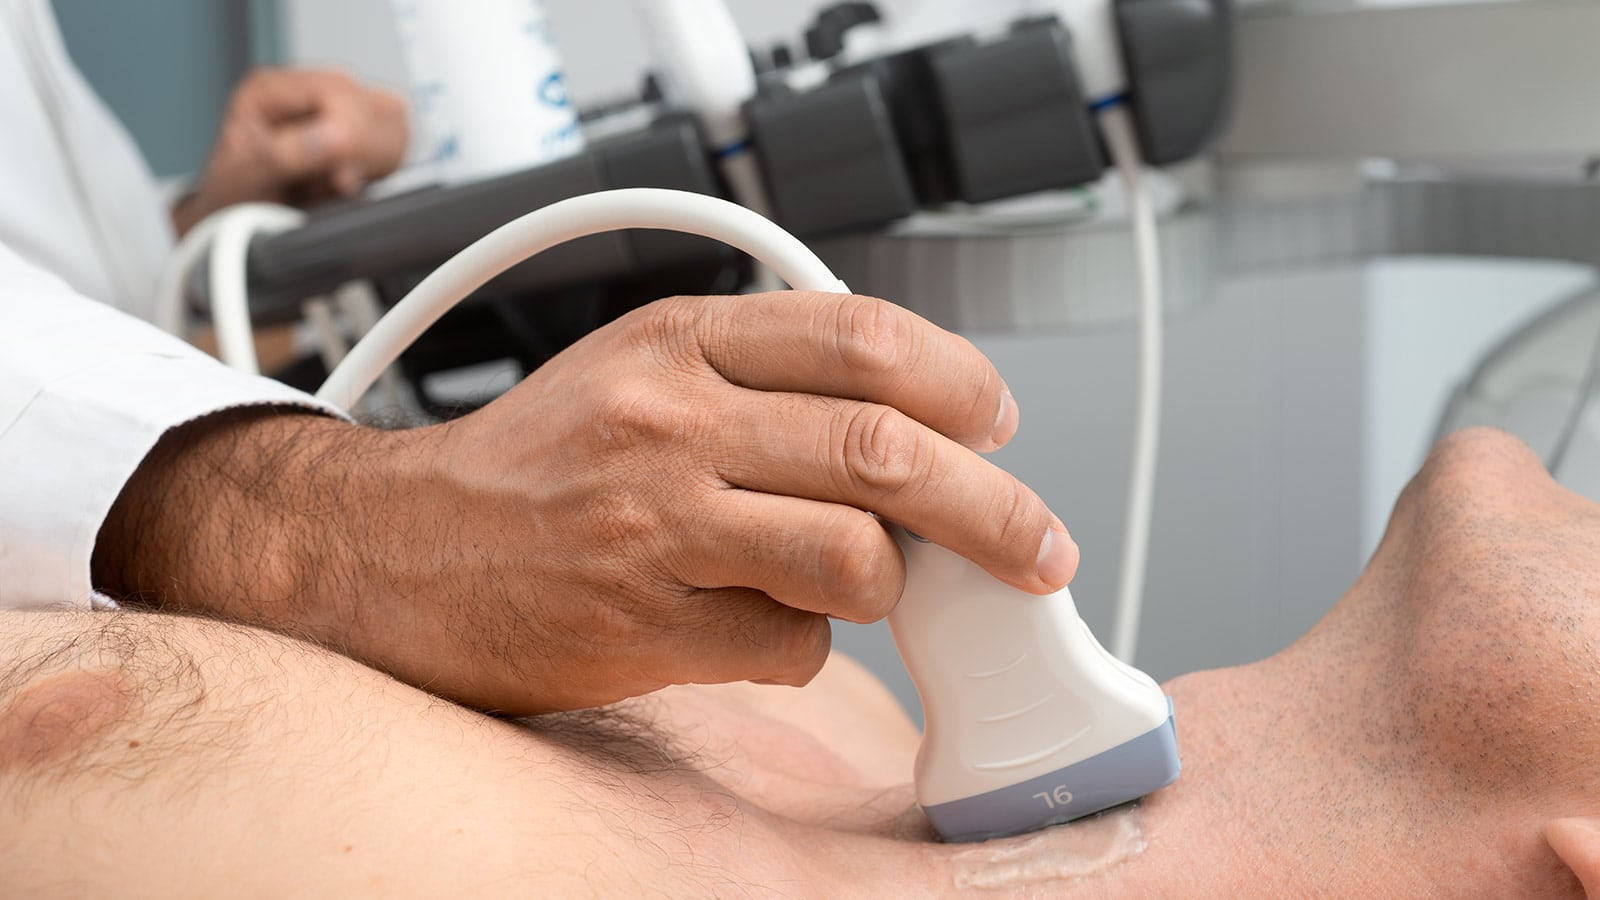 Ultraschalluntersuchung Halsschlagader Kardiologie Close-Up Patient